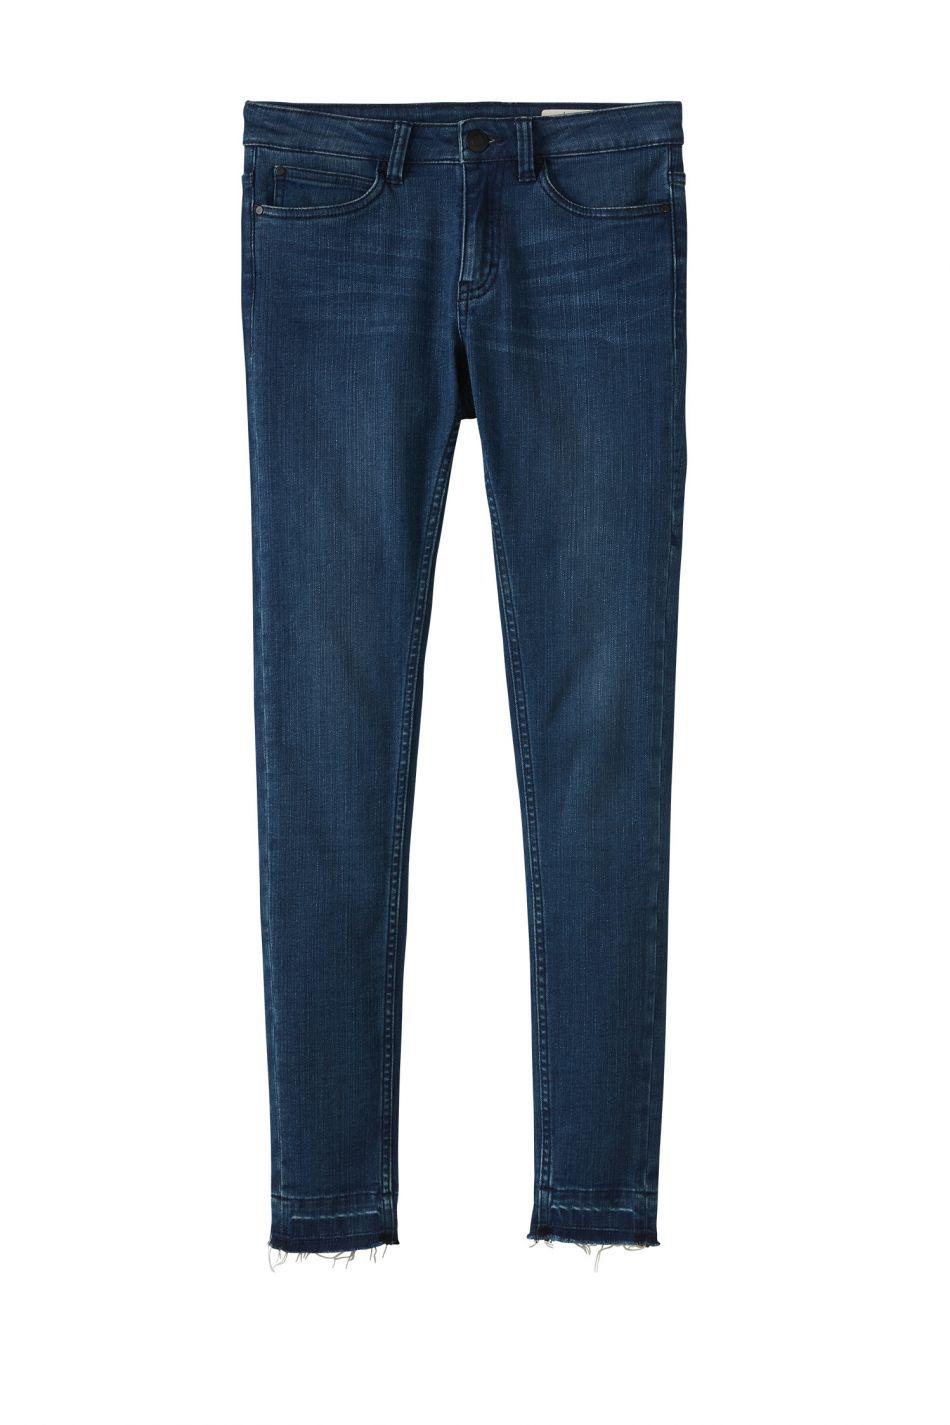 Jean super skinny, 12,99€.